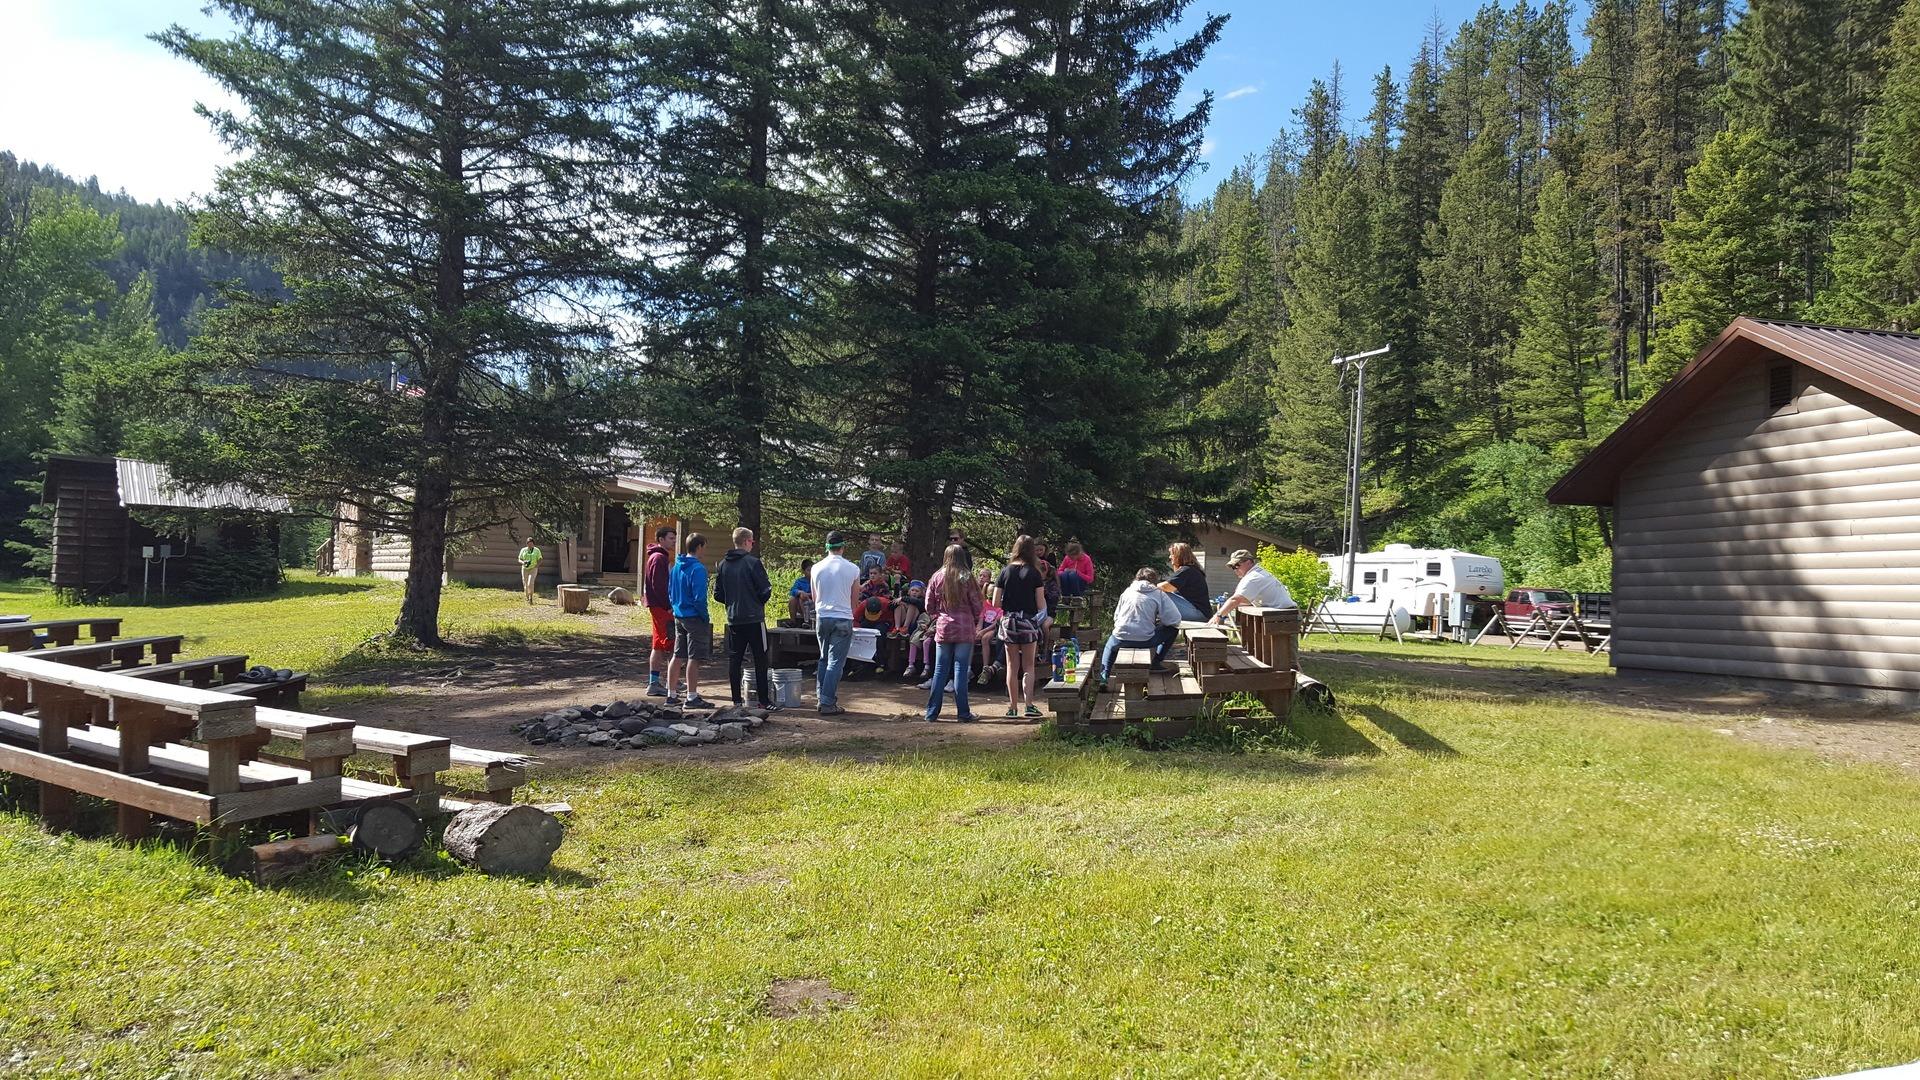 20 - Morning Camp Briefing